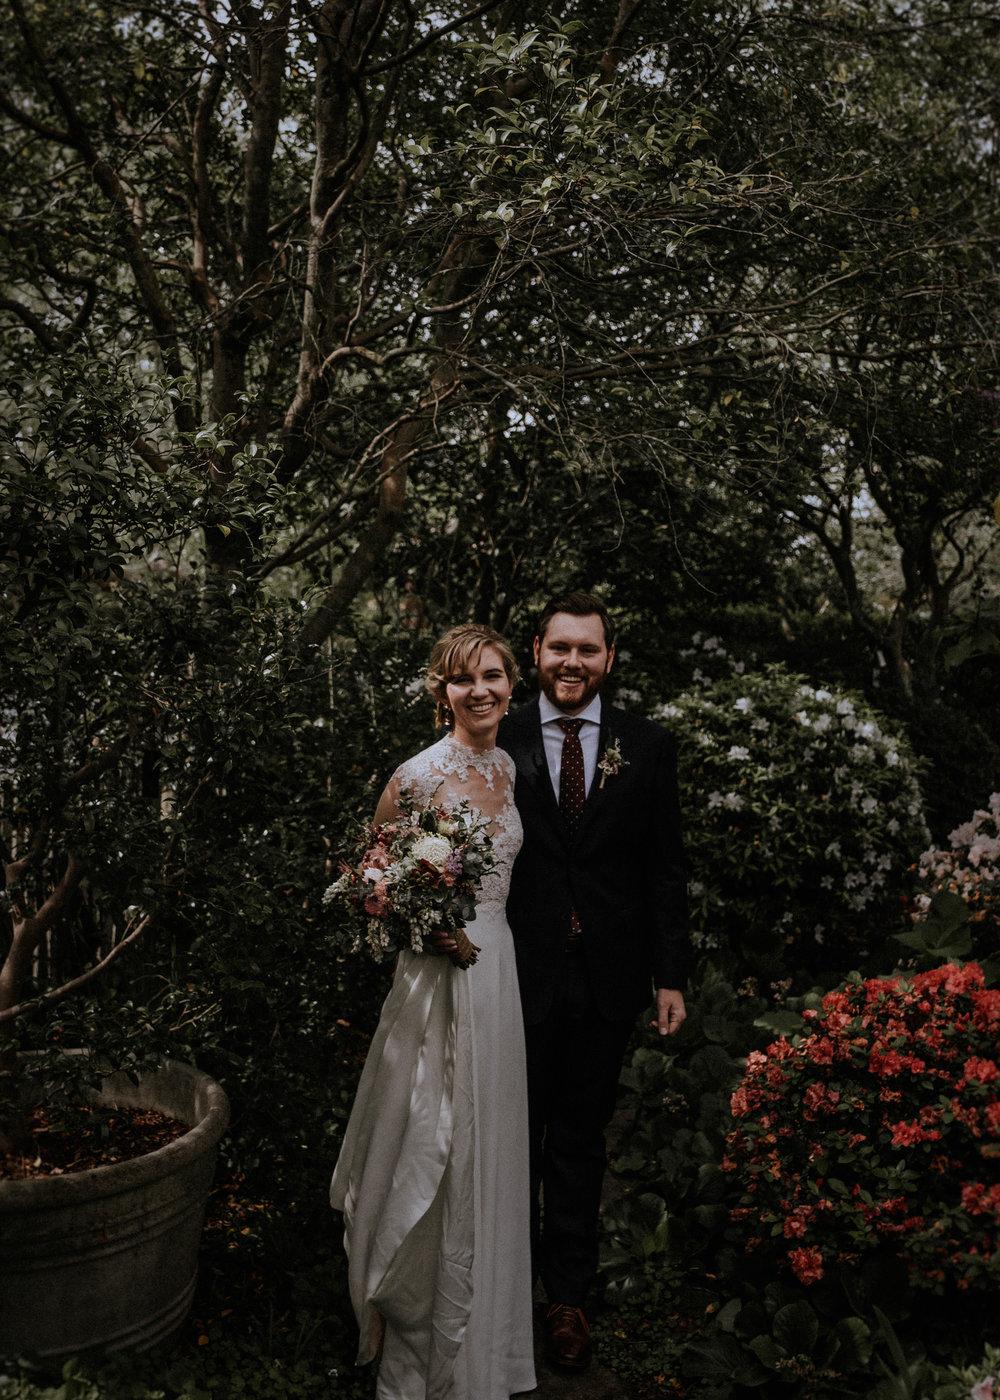 R+M_elopement wedding photography_kings & thieves_blog (73 of 326).jpg